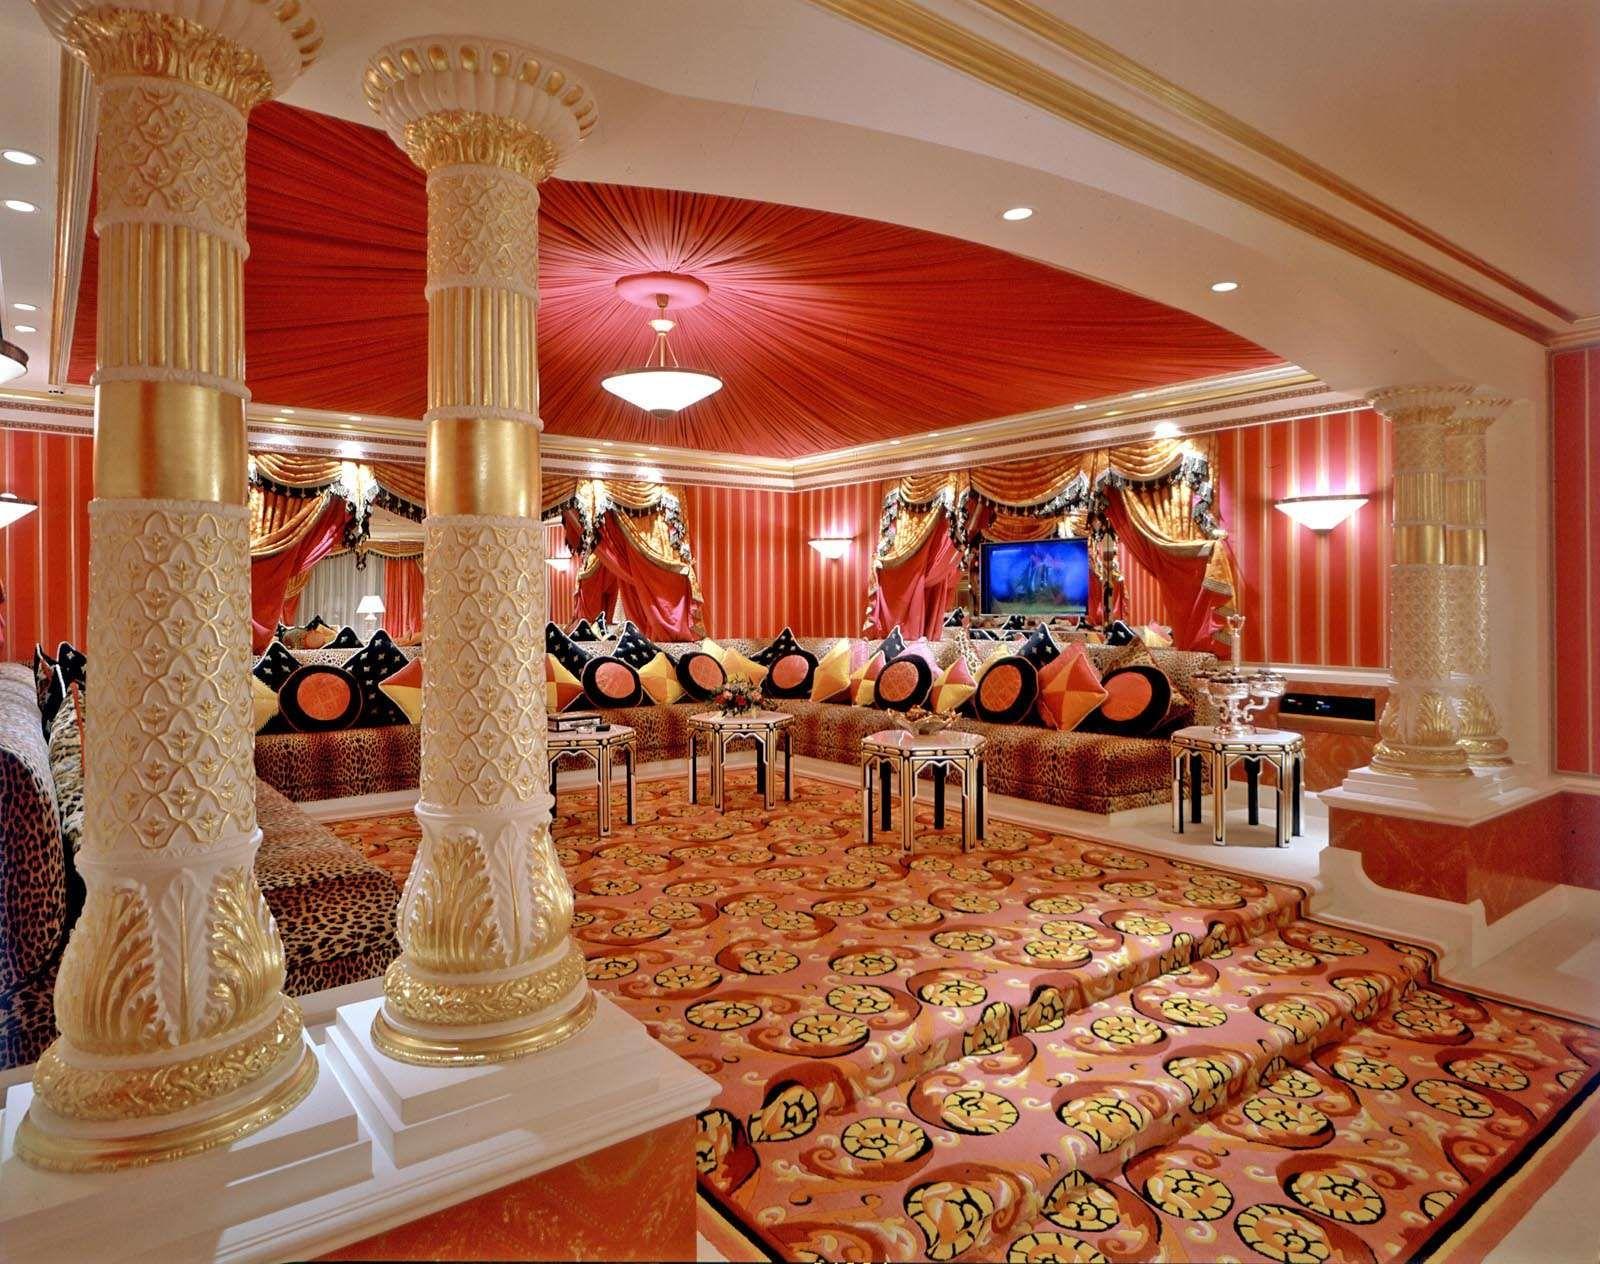 al burj hotel, dubai - 7 star hotel in dubai: al burj hotel